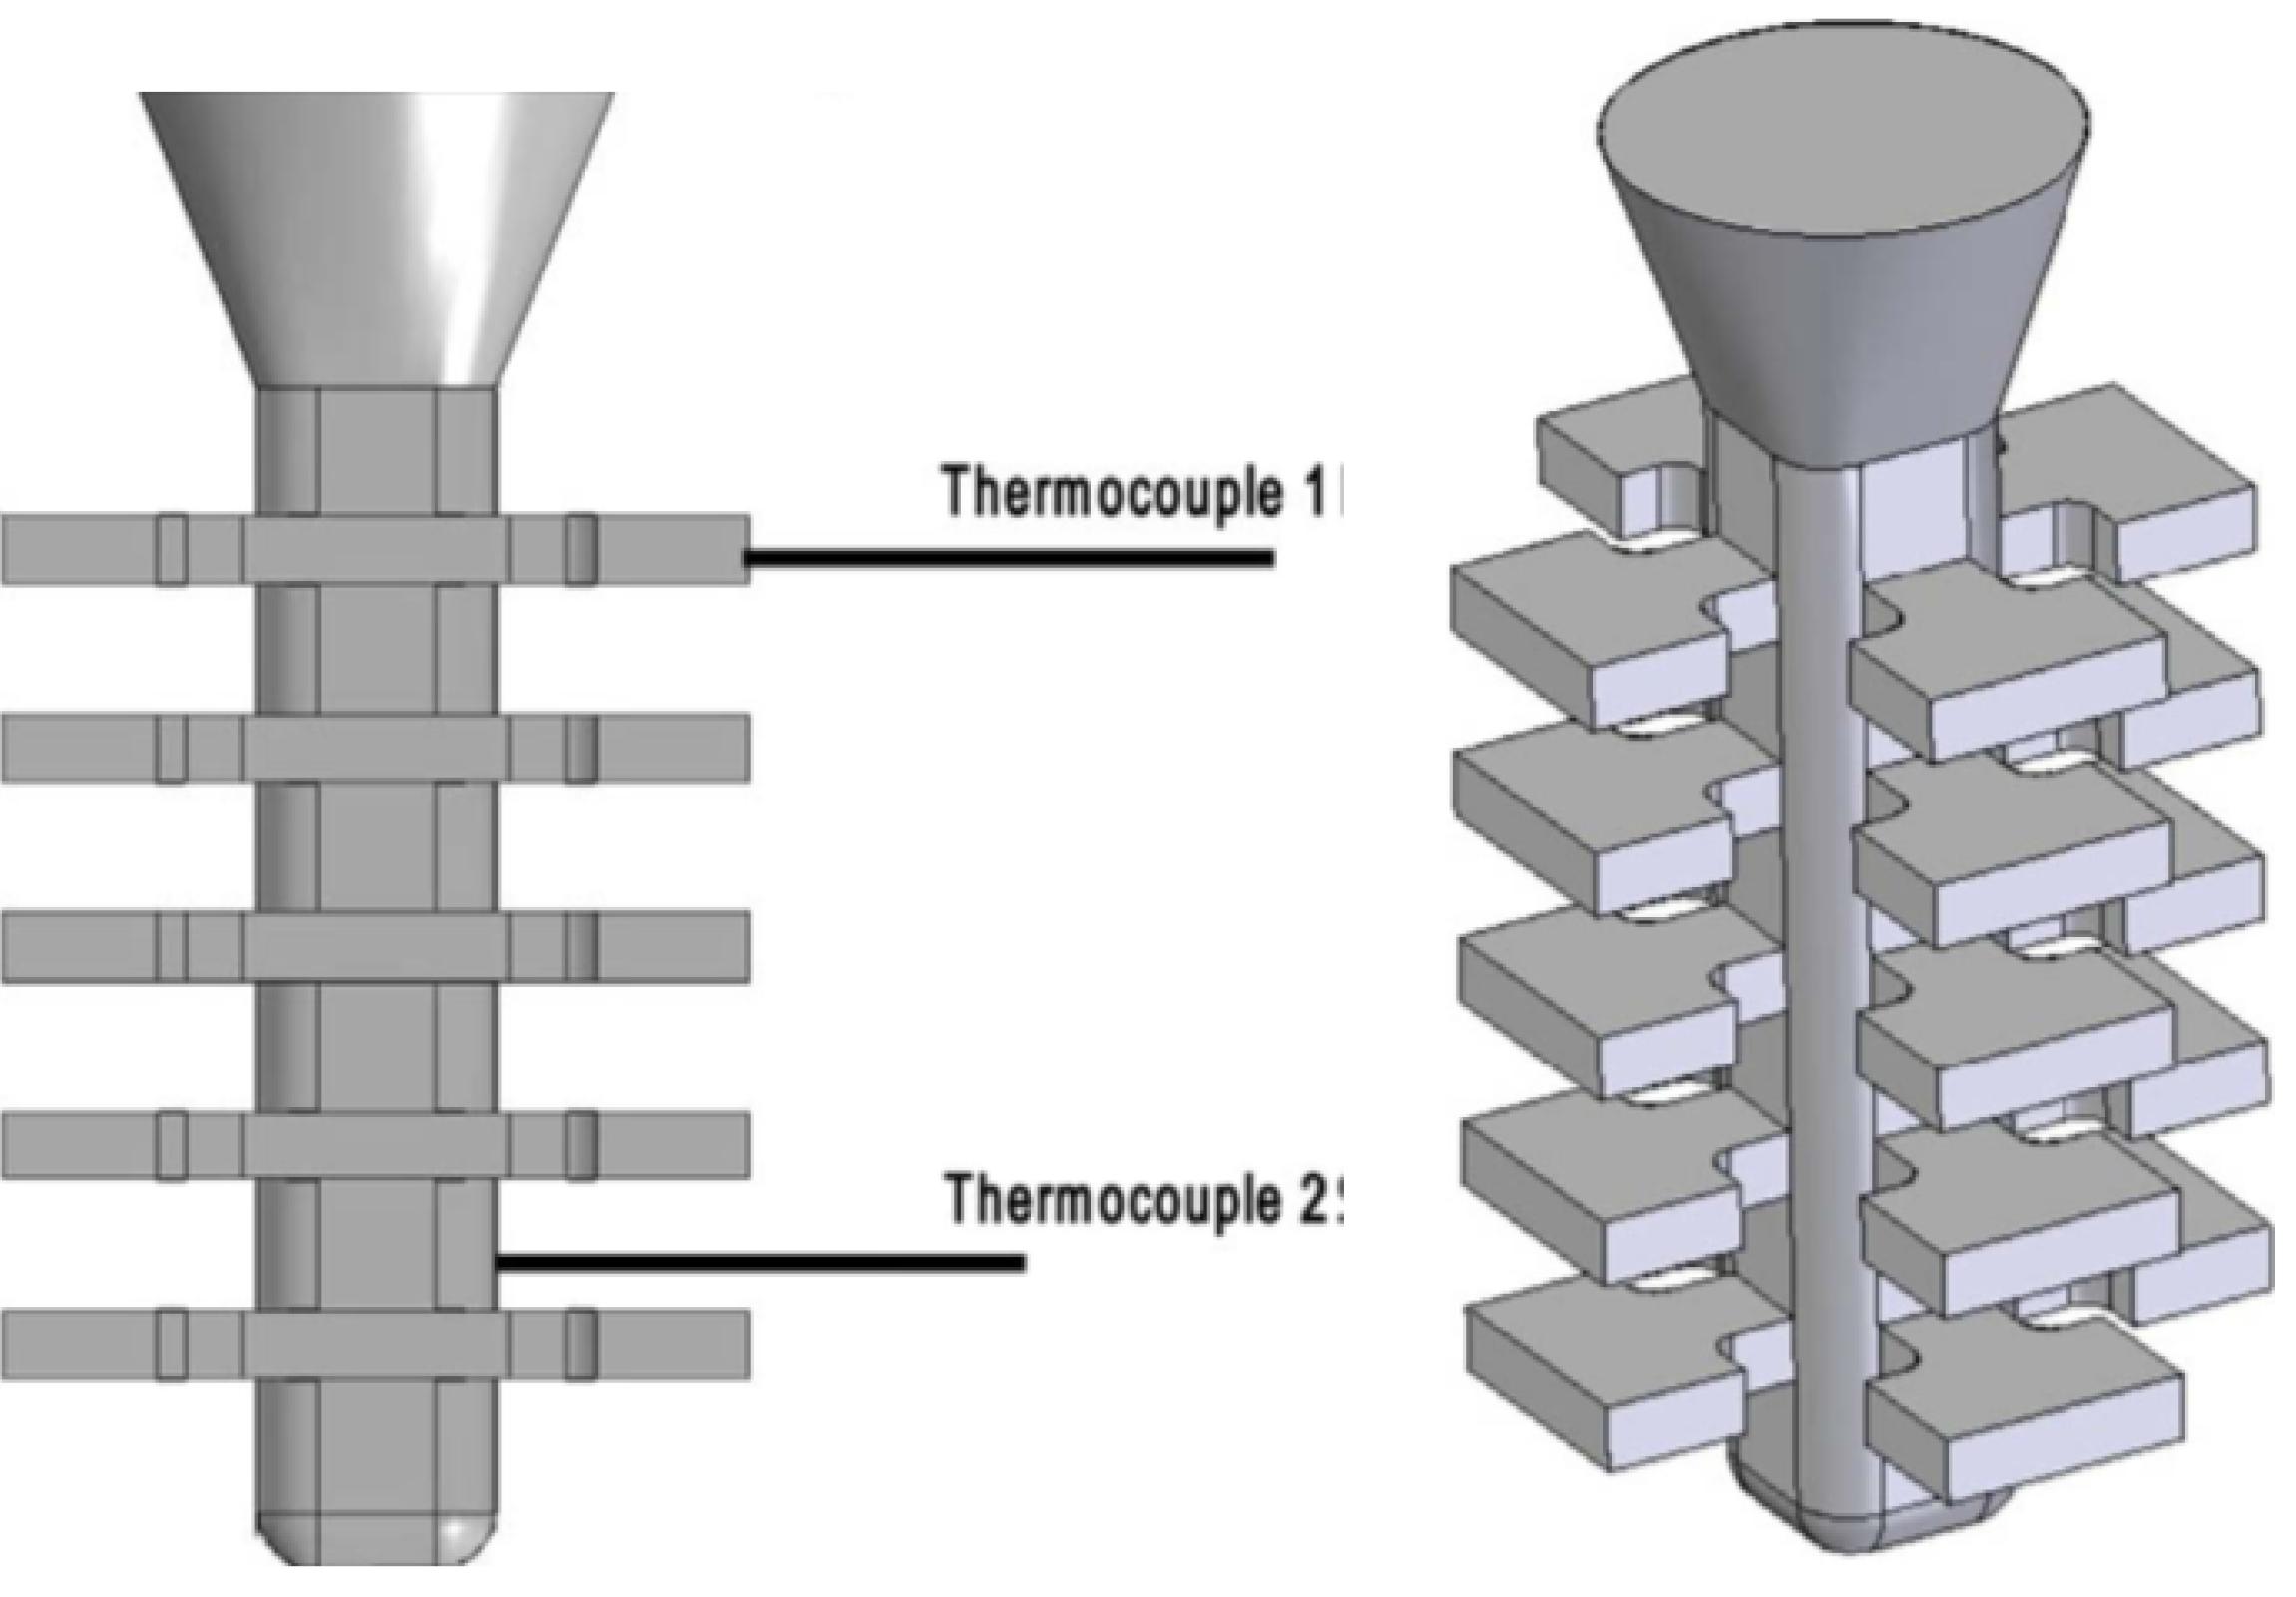 Modeling and Simulation of Heat Transfer Phenomena | IntechOpen